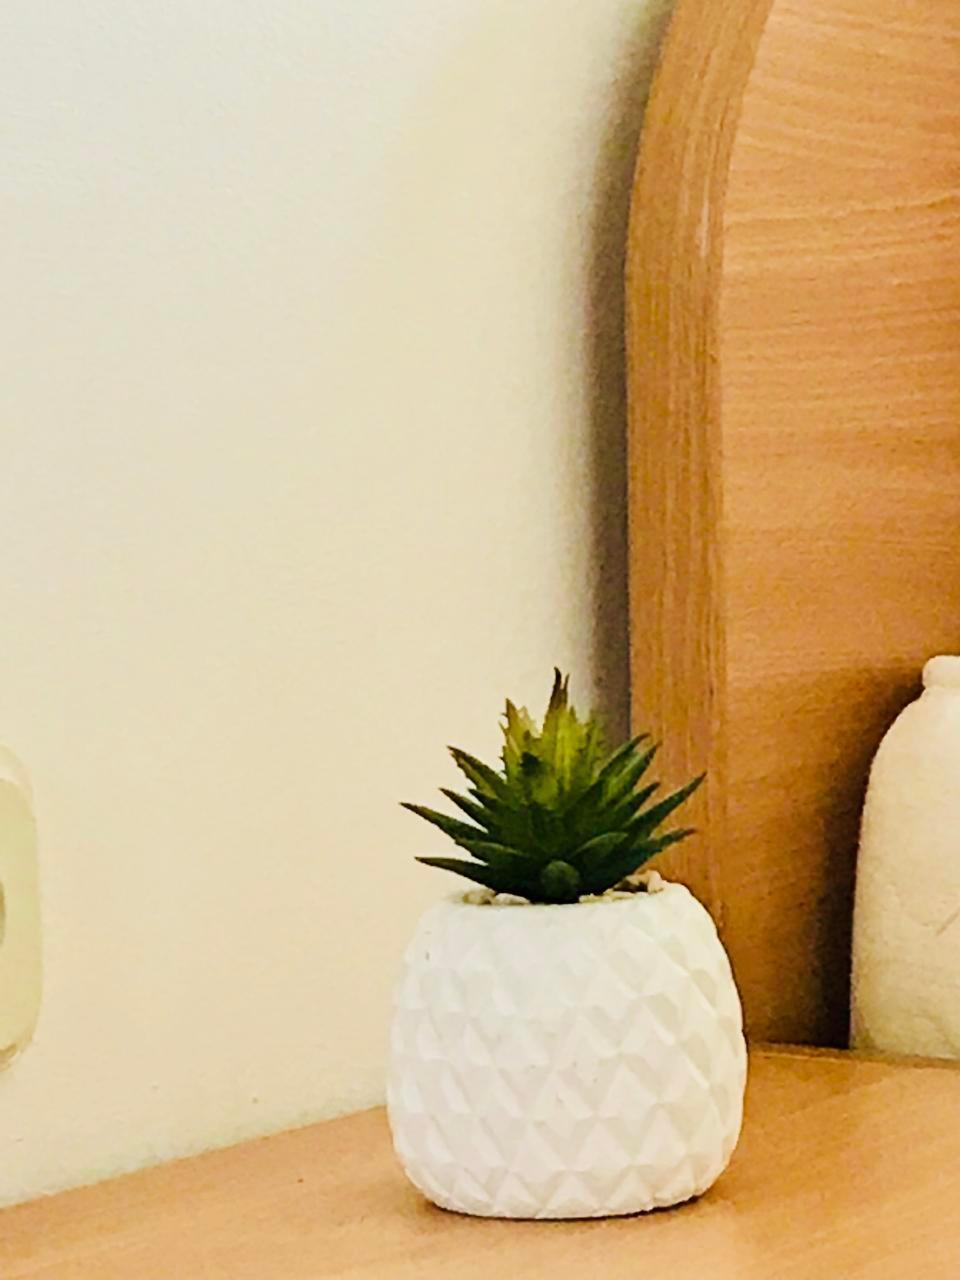 Ferienwohnung Apartmenthaus Ruza 6 - Apartment (98382), Kaštel Štafilić, , Dalmatien, Kroatien, Bild 32